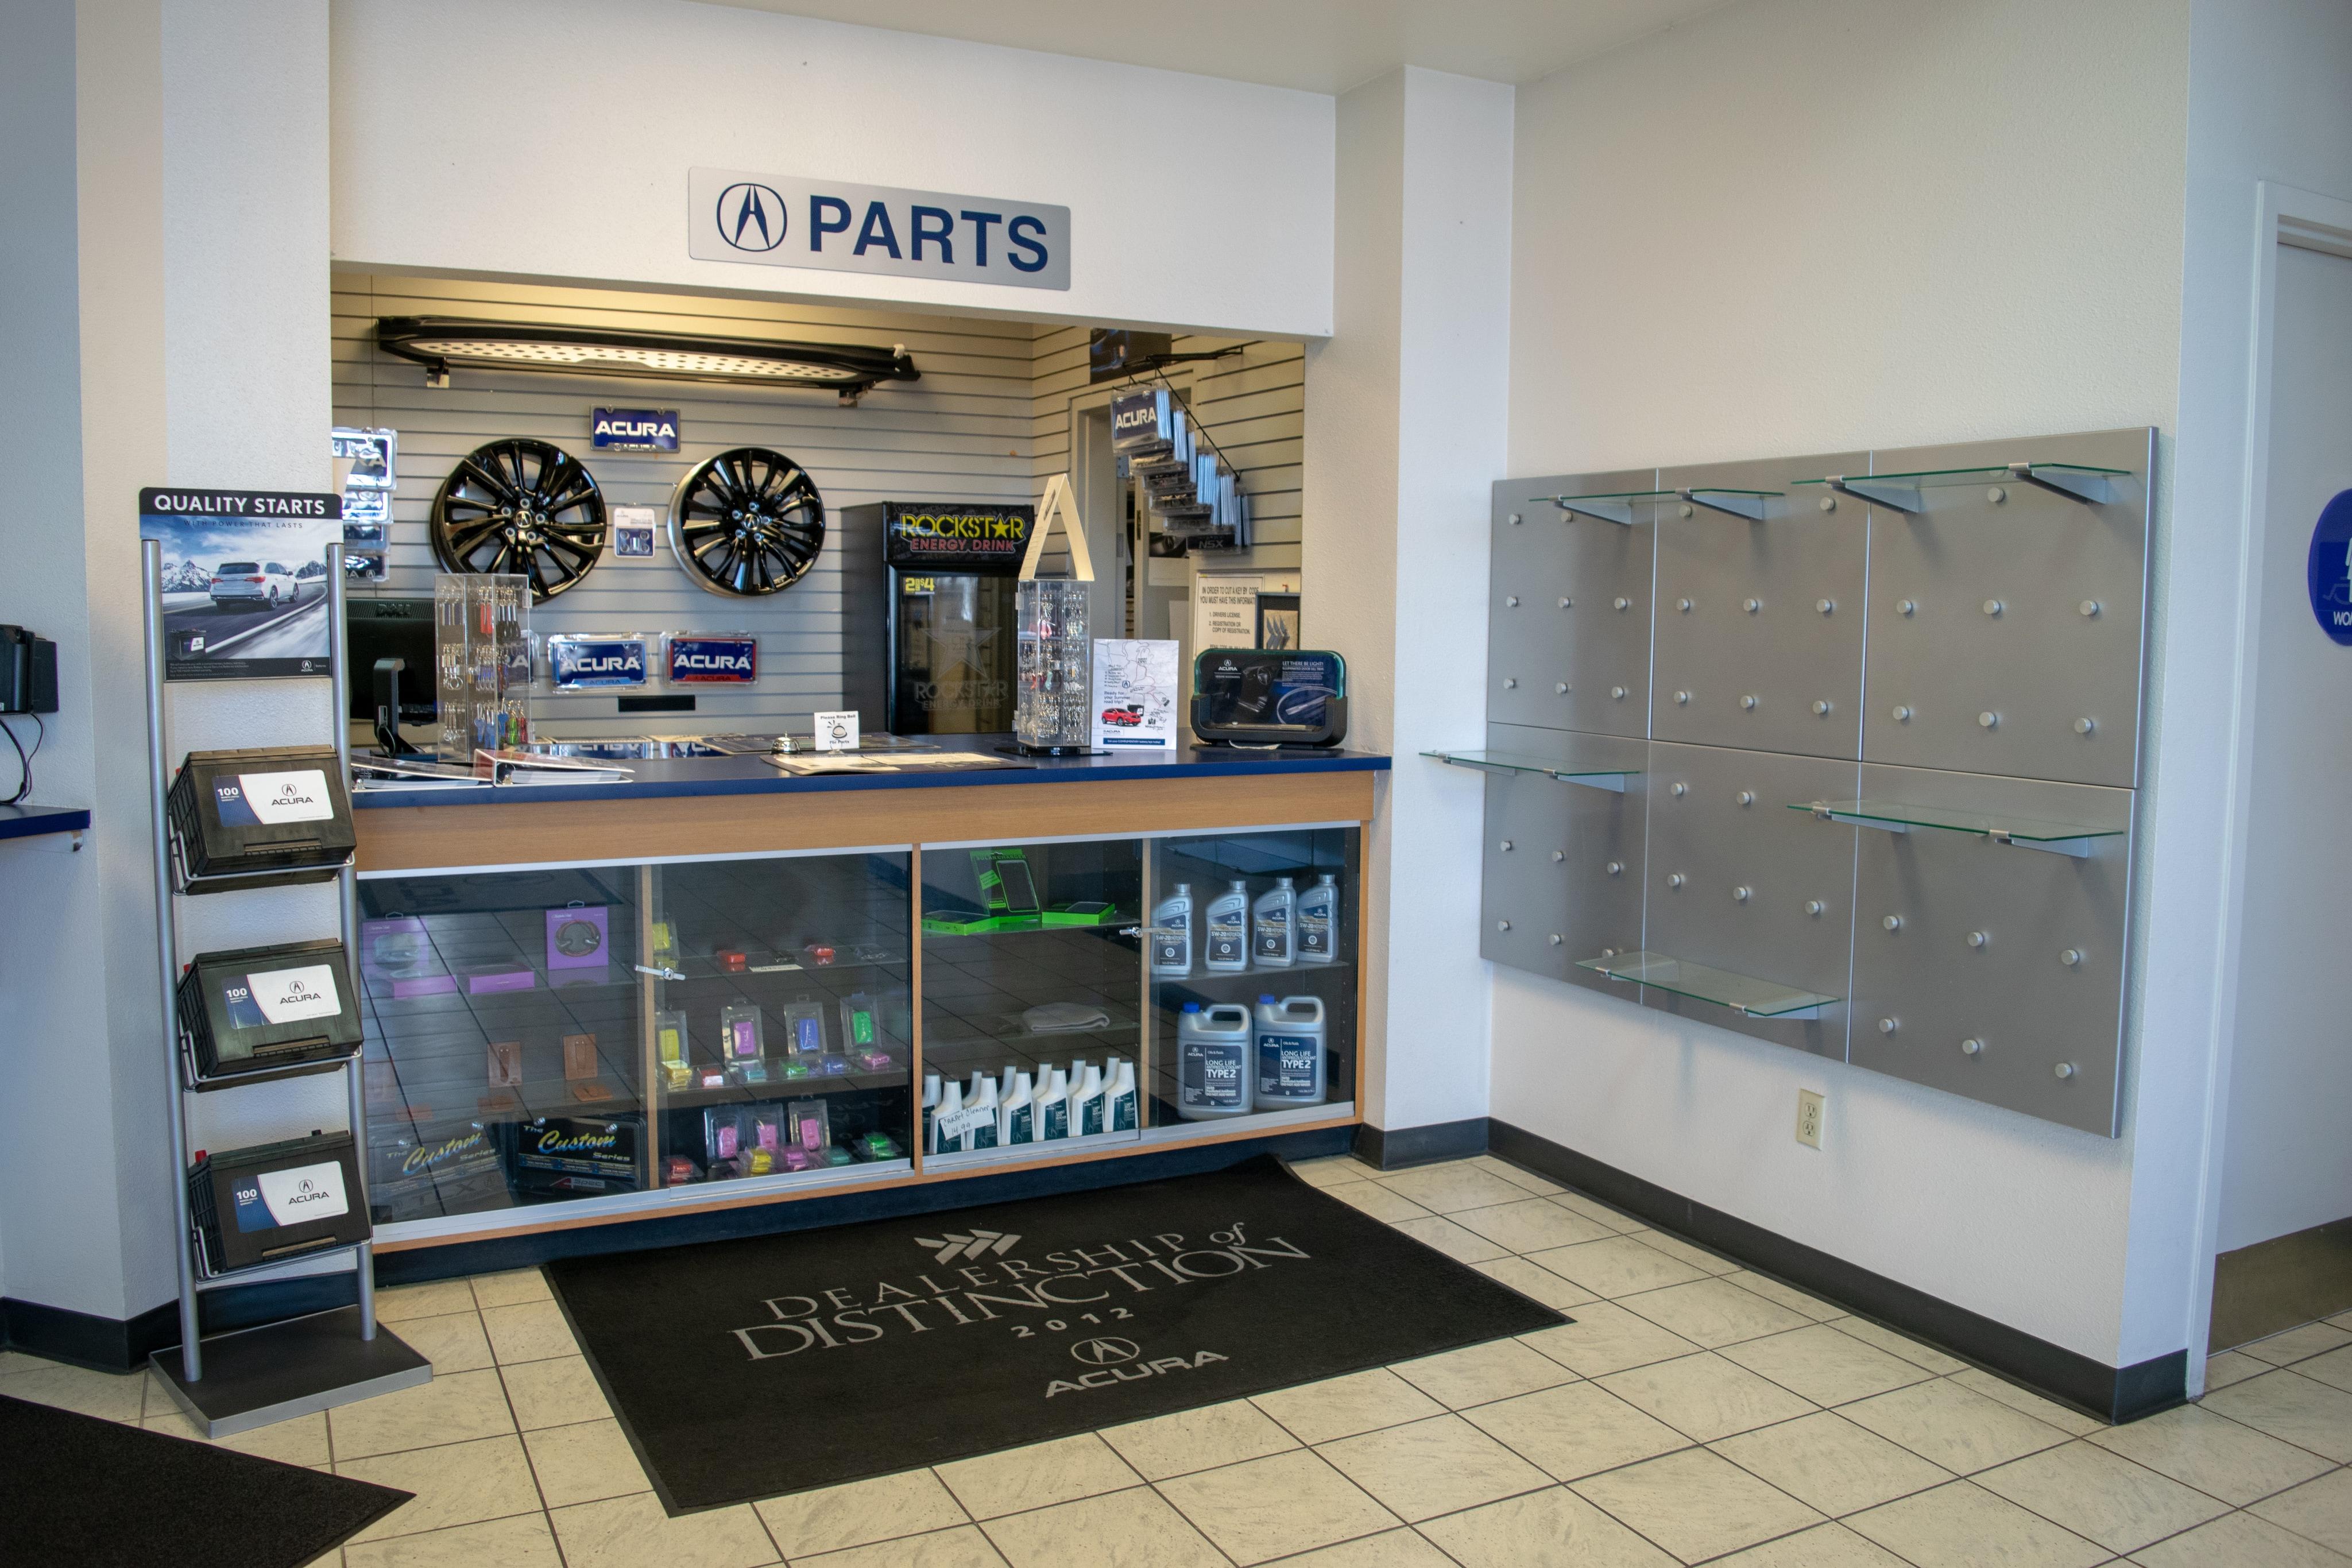 Stockton Acura Car Parts Acura Of Stockton Auto Parts Serving - Acura parts dealer